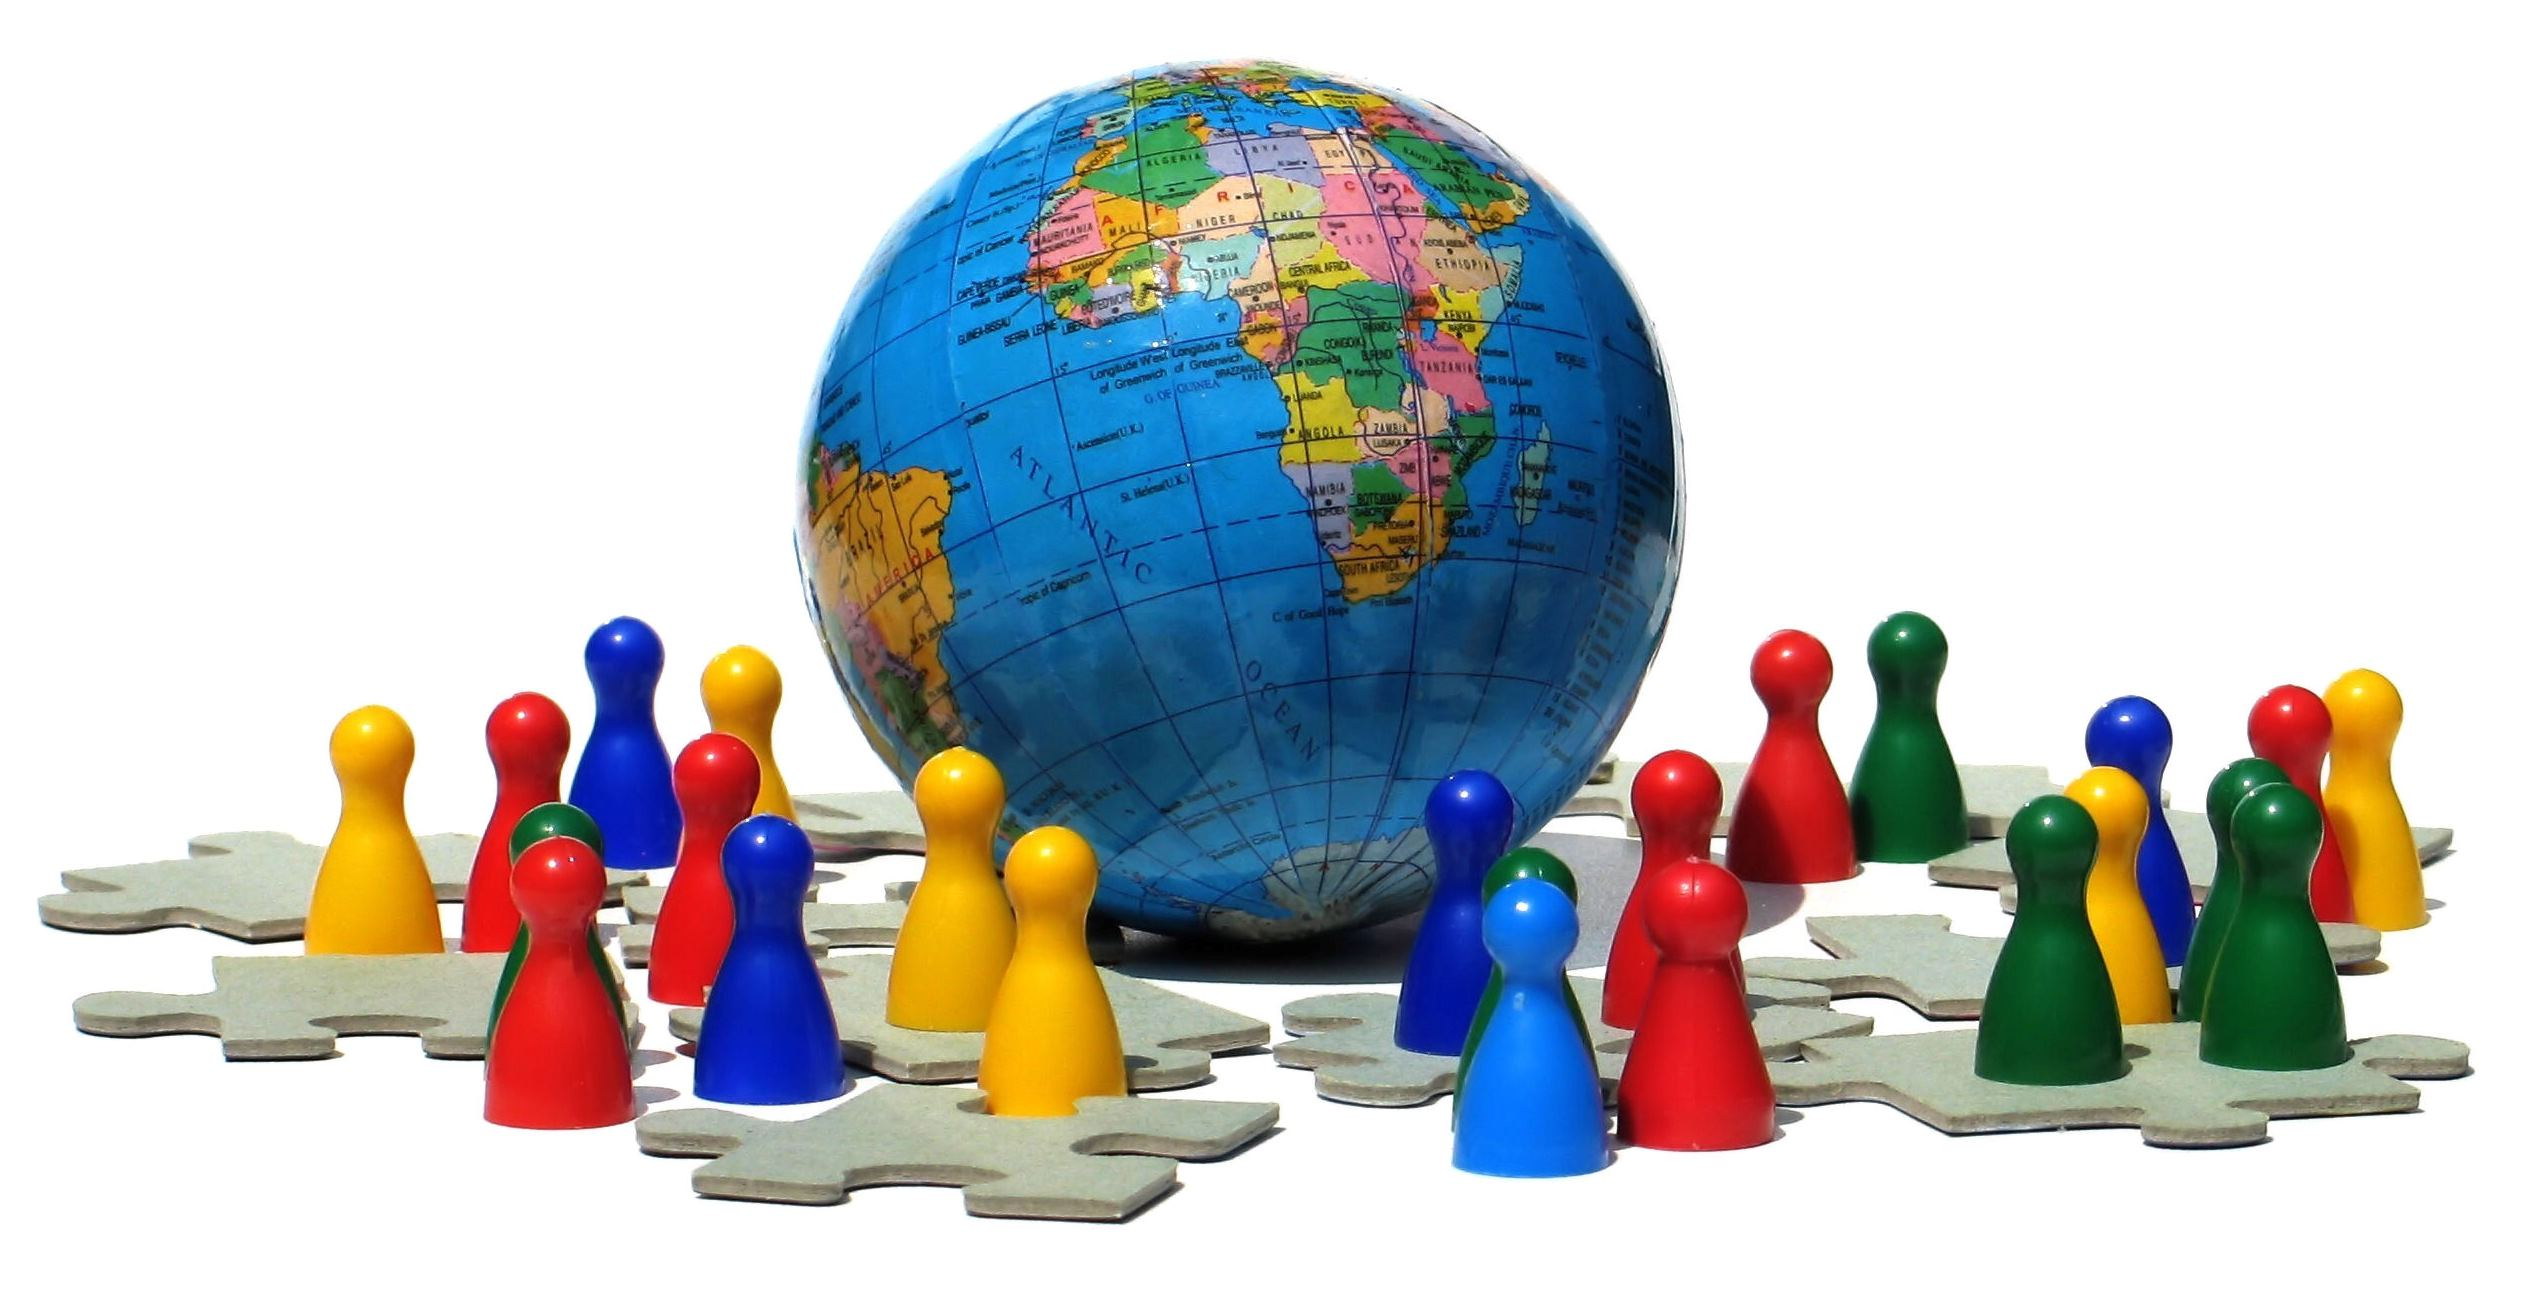 interculturalcommunication